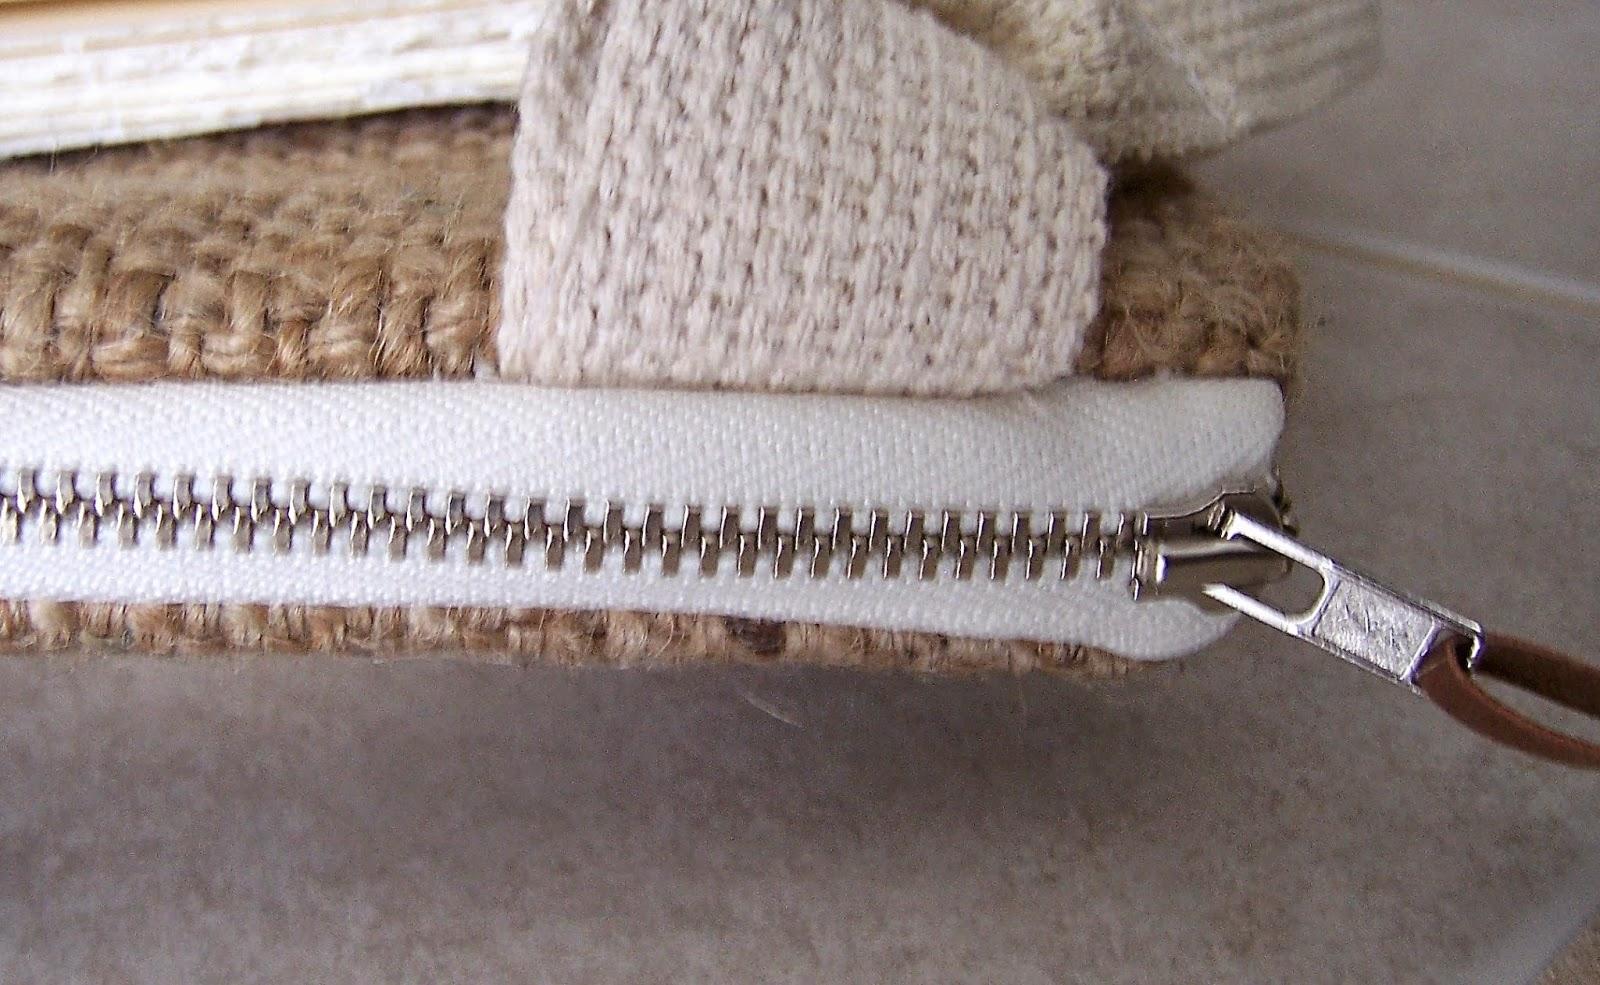 Jute Mills burlap bag zipper - linaandvi.blogspot.com - Plymouth MI